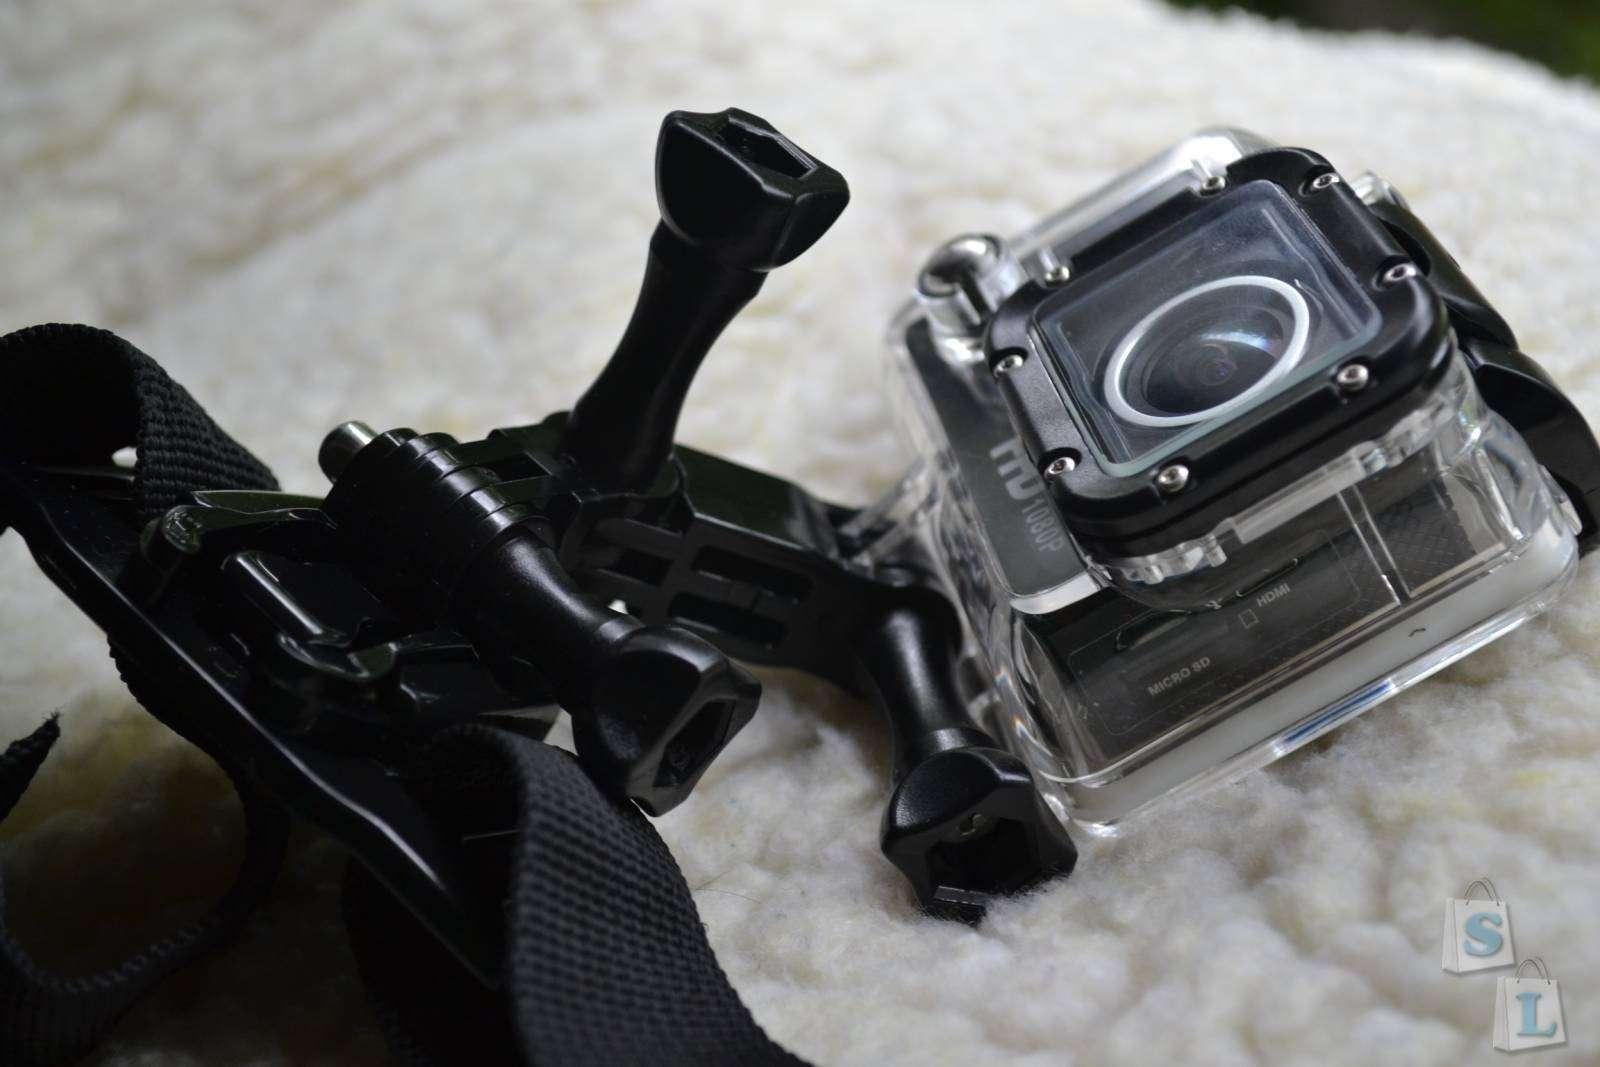 GearBest: Amkov AMK5000 Action camera - WiFi, 1080P FHD, Sunplus 6330M Chipset